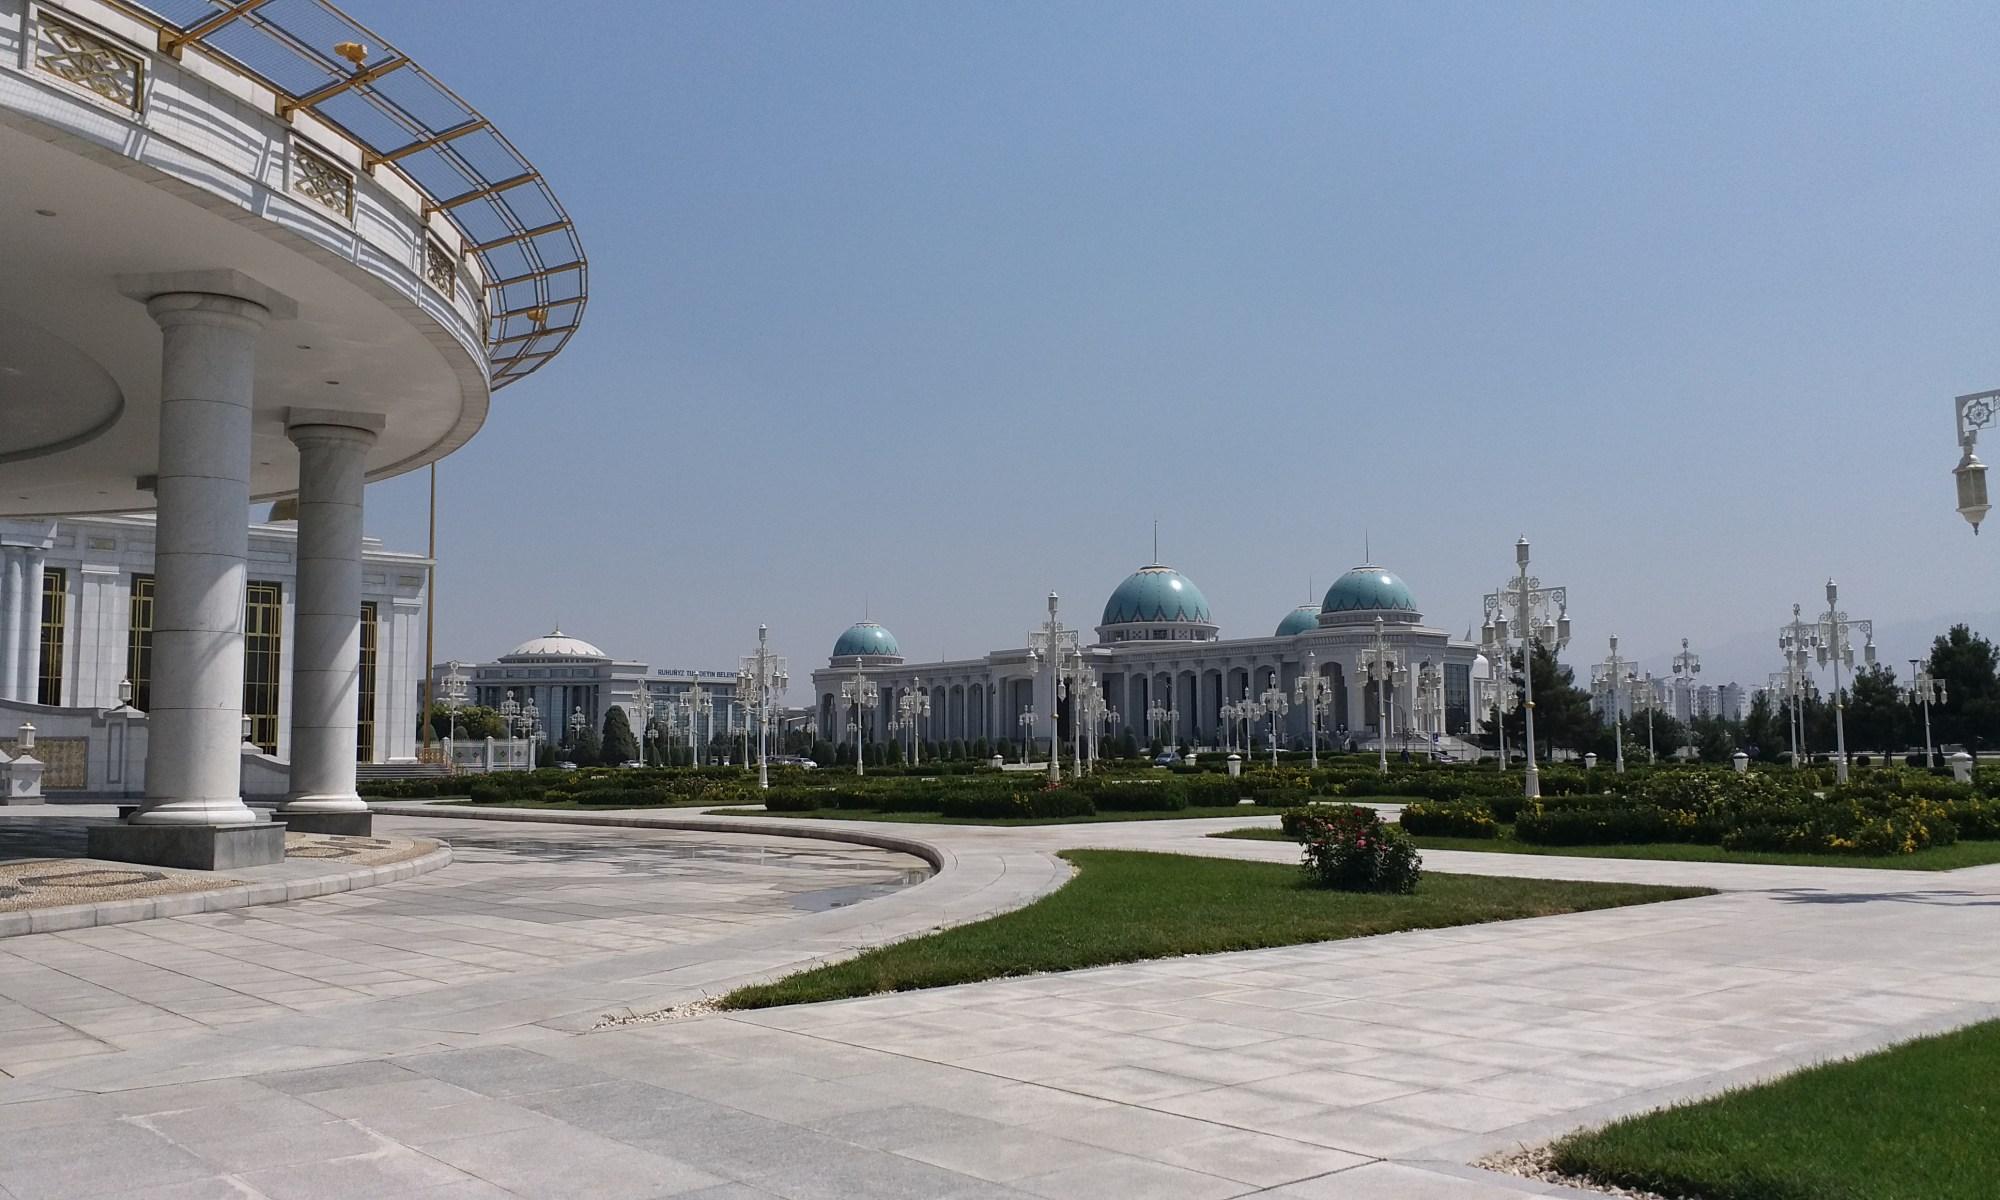 K in Motion Travel Blog. Travel to Turkmenistan - Overly Impressive Capital to Caspian Sea Port. Ashgabat White Domed Buildings